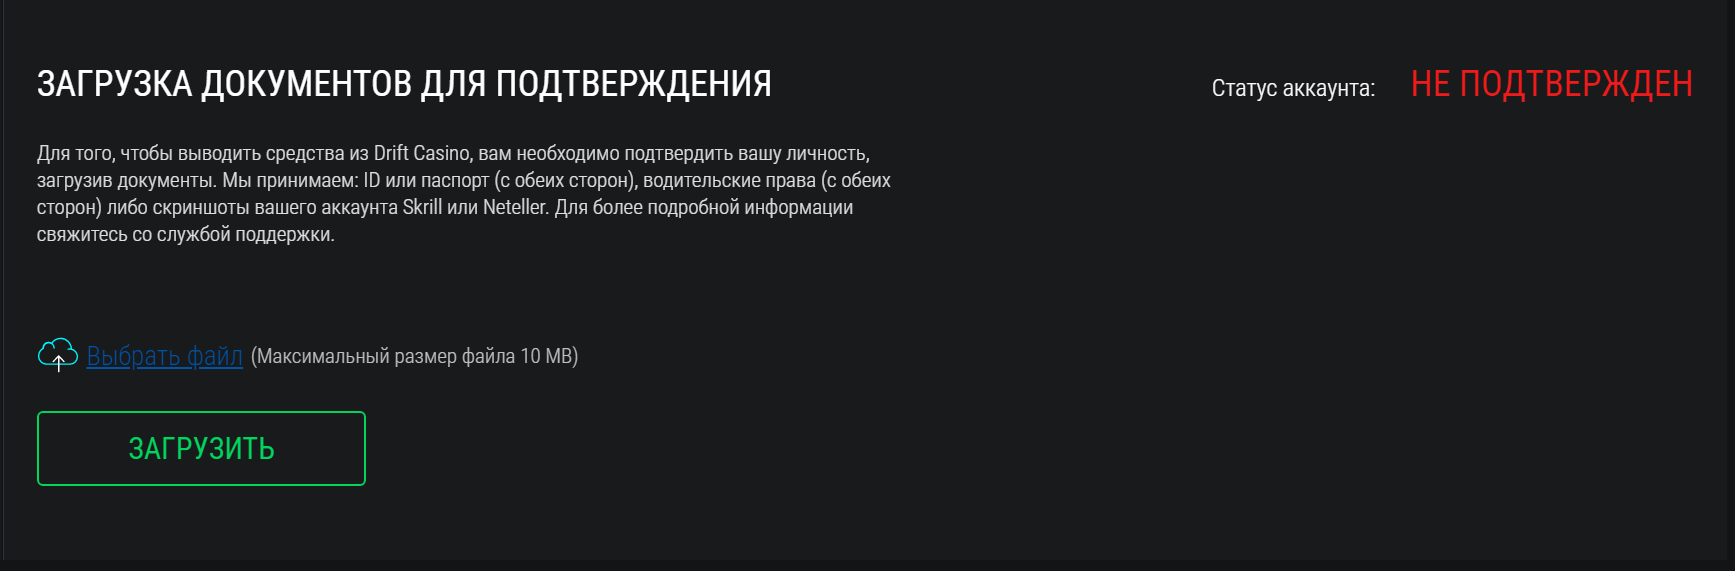 Сайт Дрифт казино